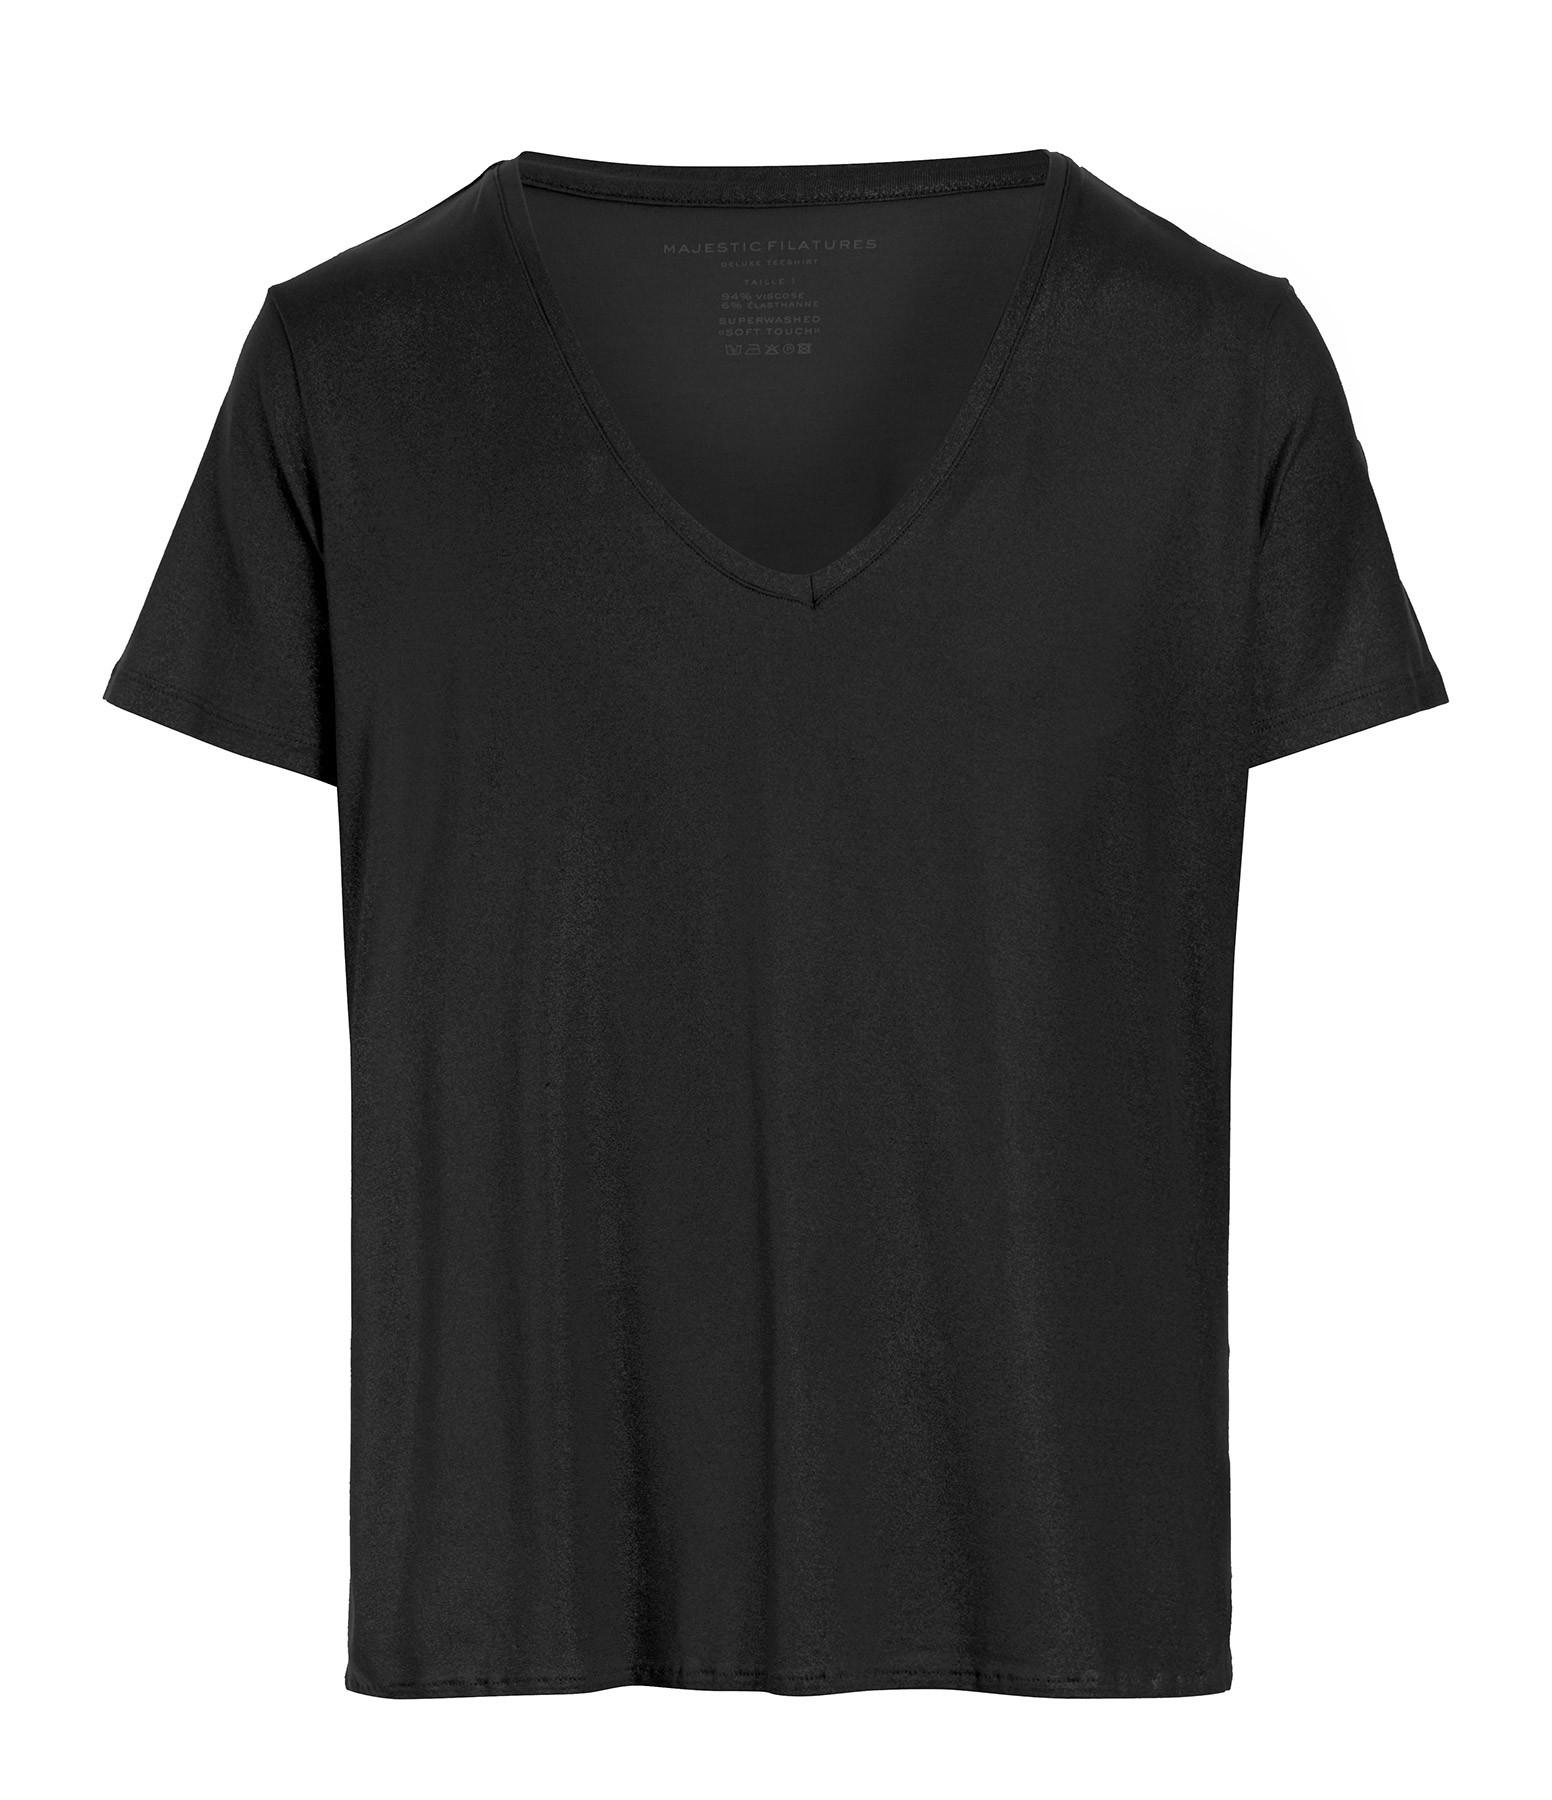 MAJESTIC FILATURES - Tee-shirt Col V Noir Métallisé